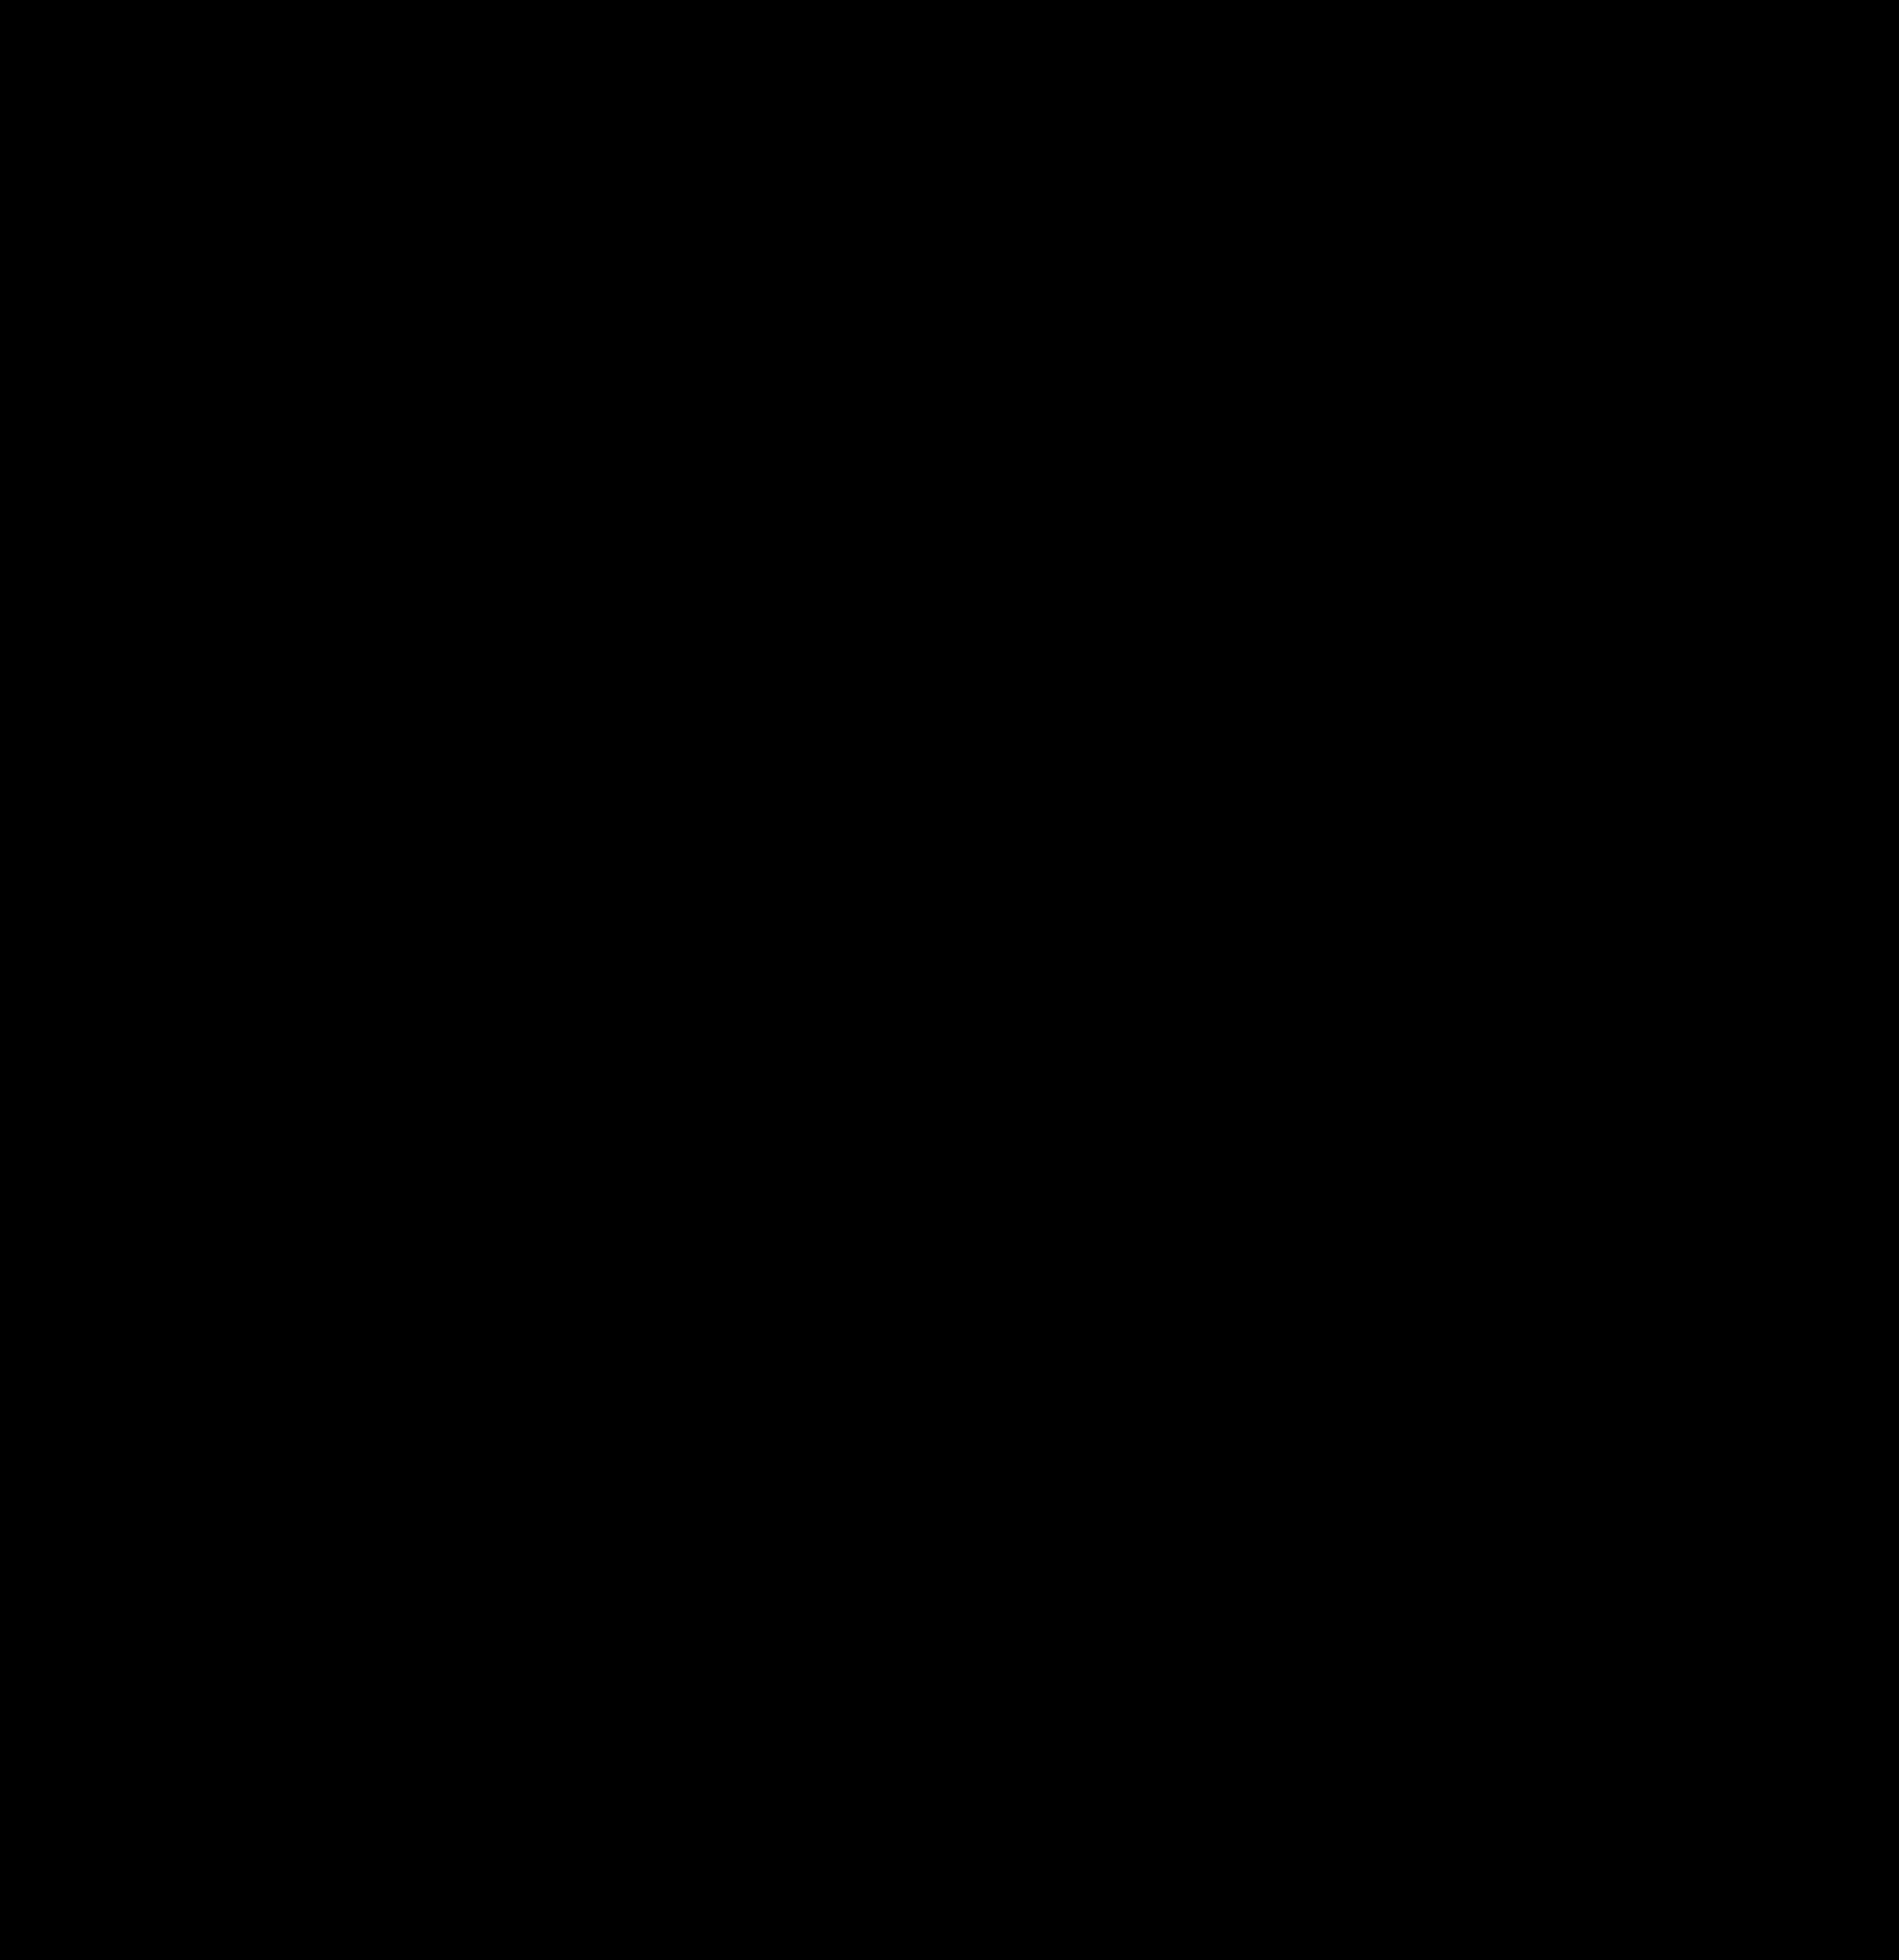 2134x2203 Clipart